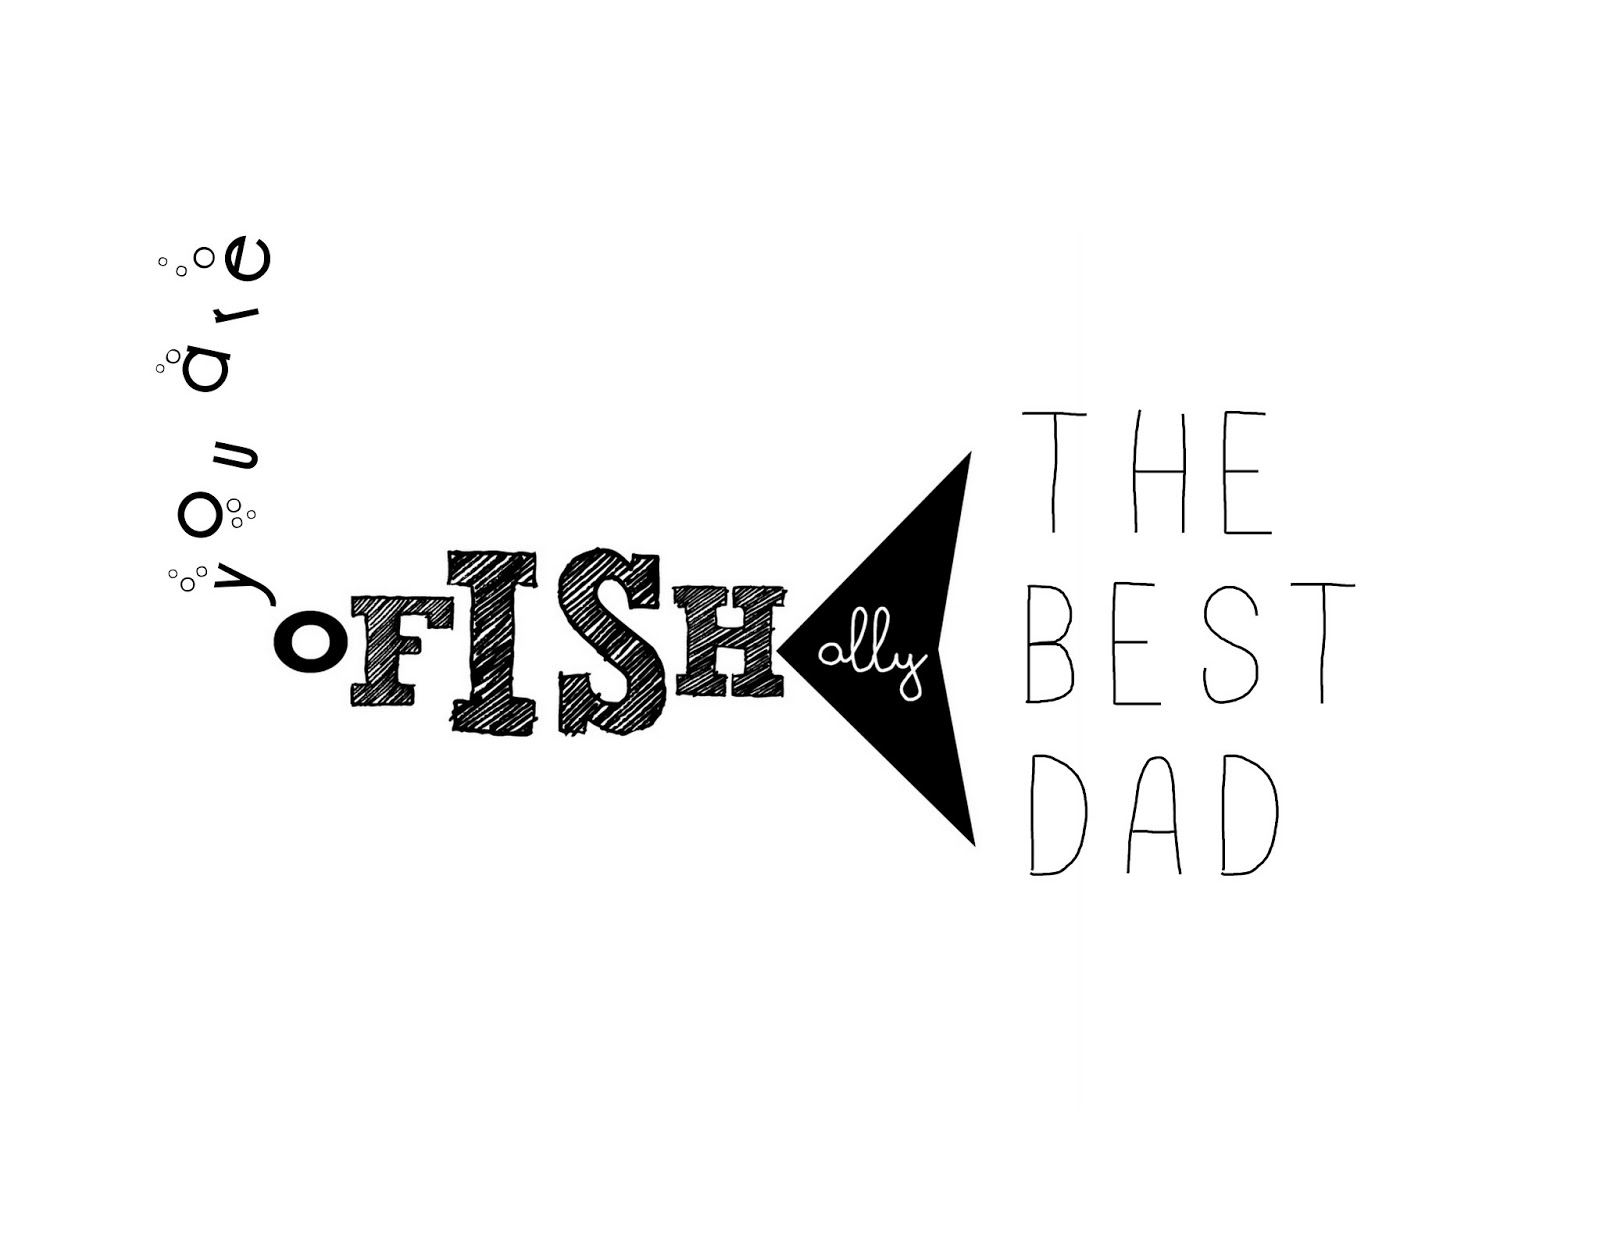 My best ally dad